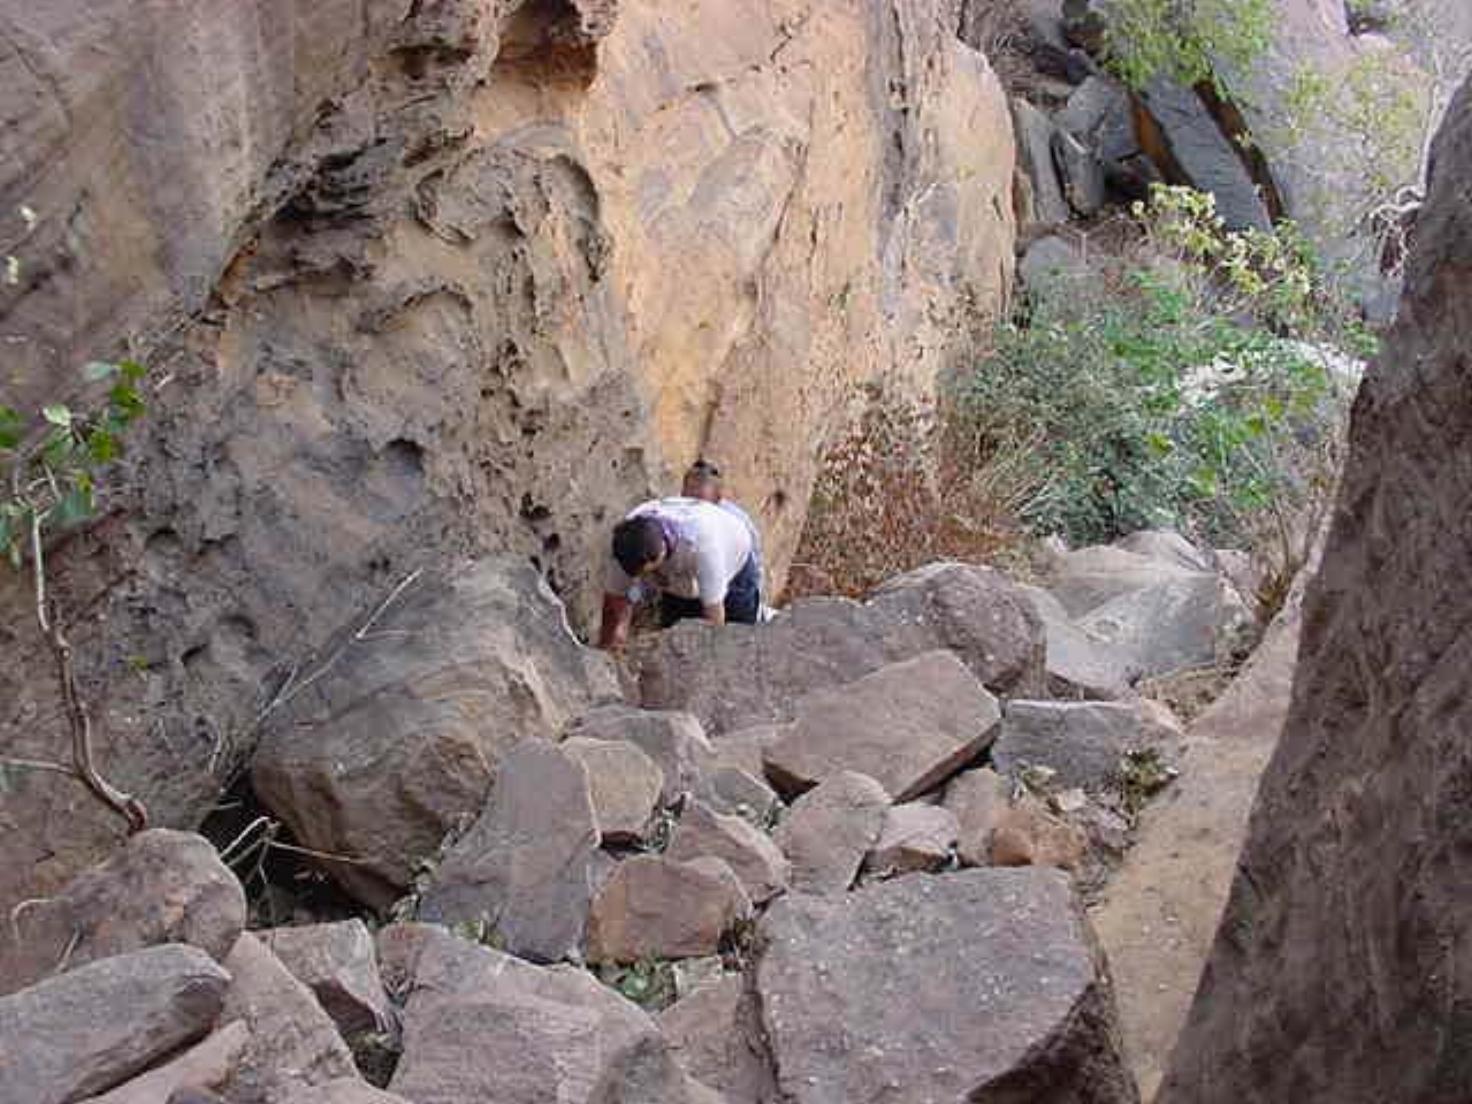 Climbing endless rocks